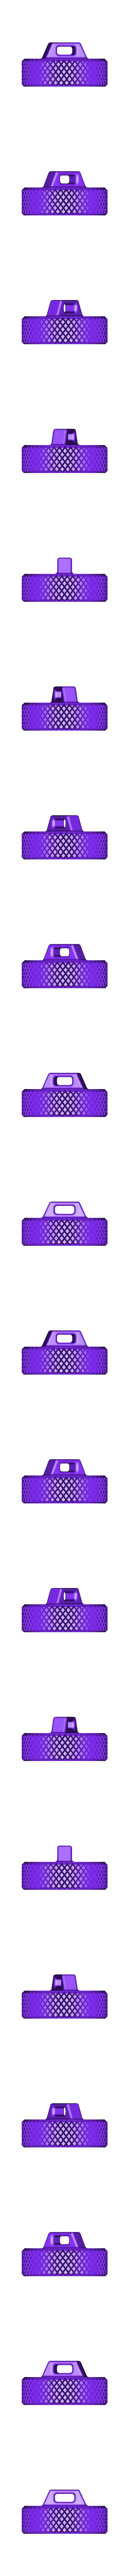 EDC-Container_Deckel.stl Download free STL file EDC-Container • 3D print model, Sparhawk